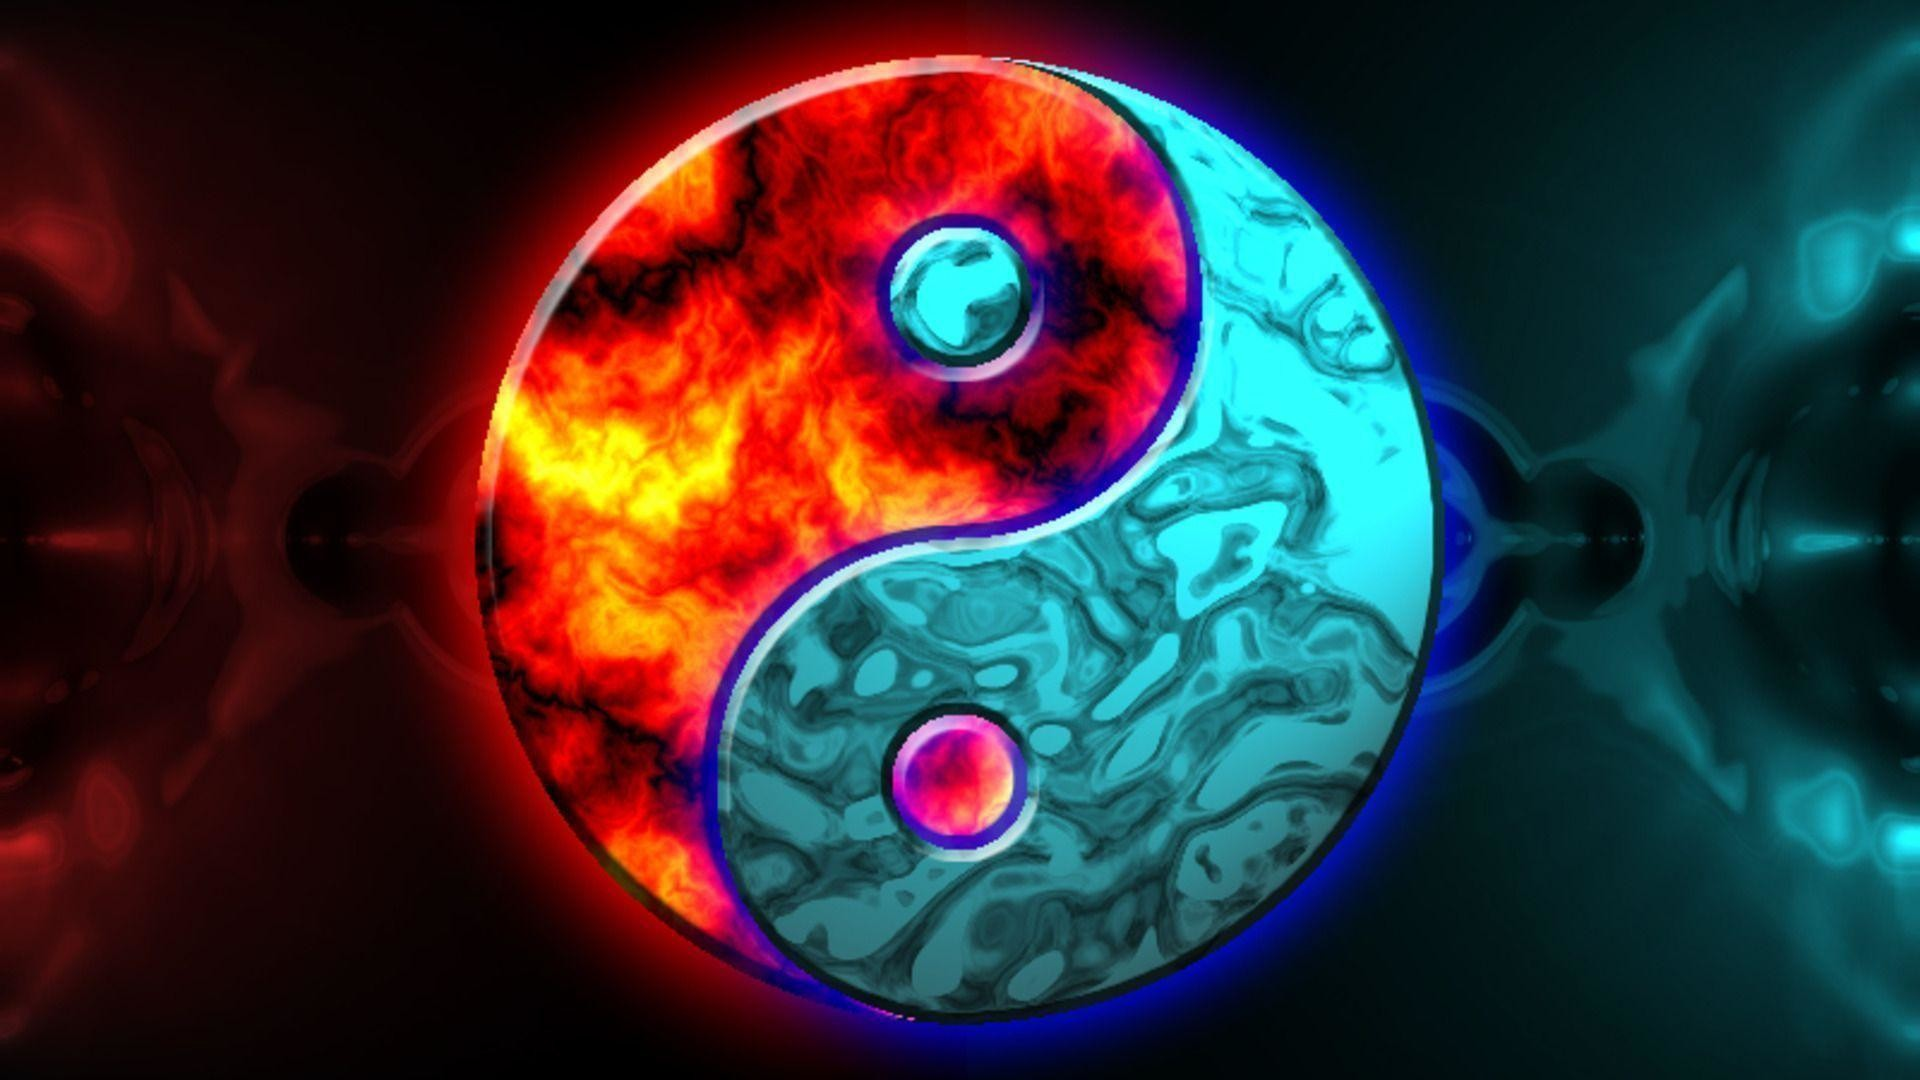 Dragon Yin Yang Wallpaper 52 Pictures